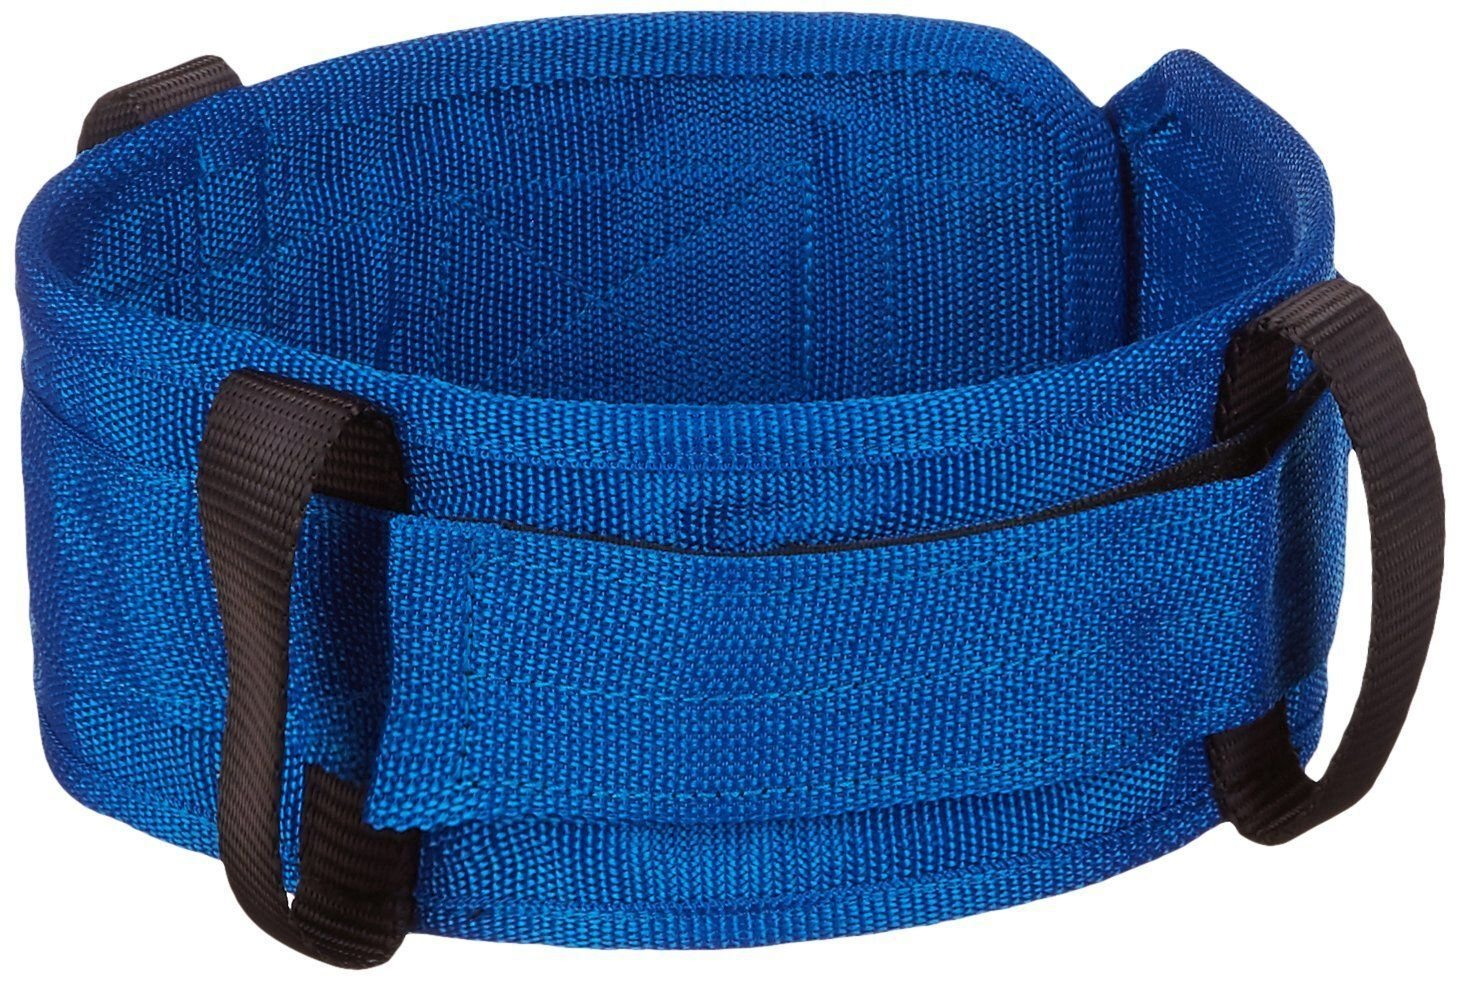 Sammons Preston Heavy-Duty Gait Belt with Handles, 36''-42'' Long Adjustable Transfer Belt, Medical Patient Lift Belt for Limited Mobility, Caregiver Assistance Aid for Elderly & Handicapped, Size Large